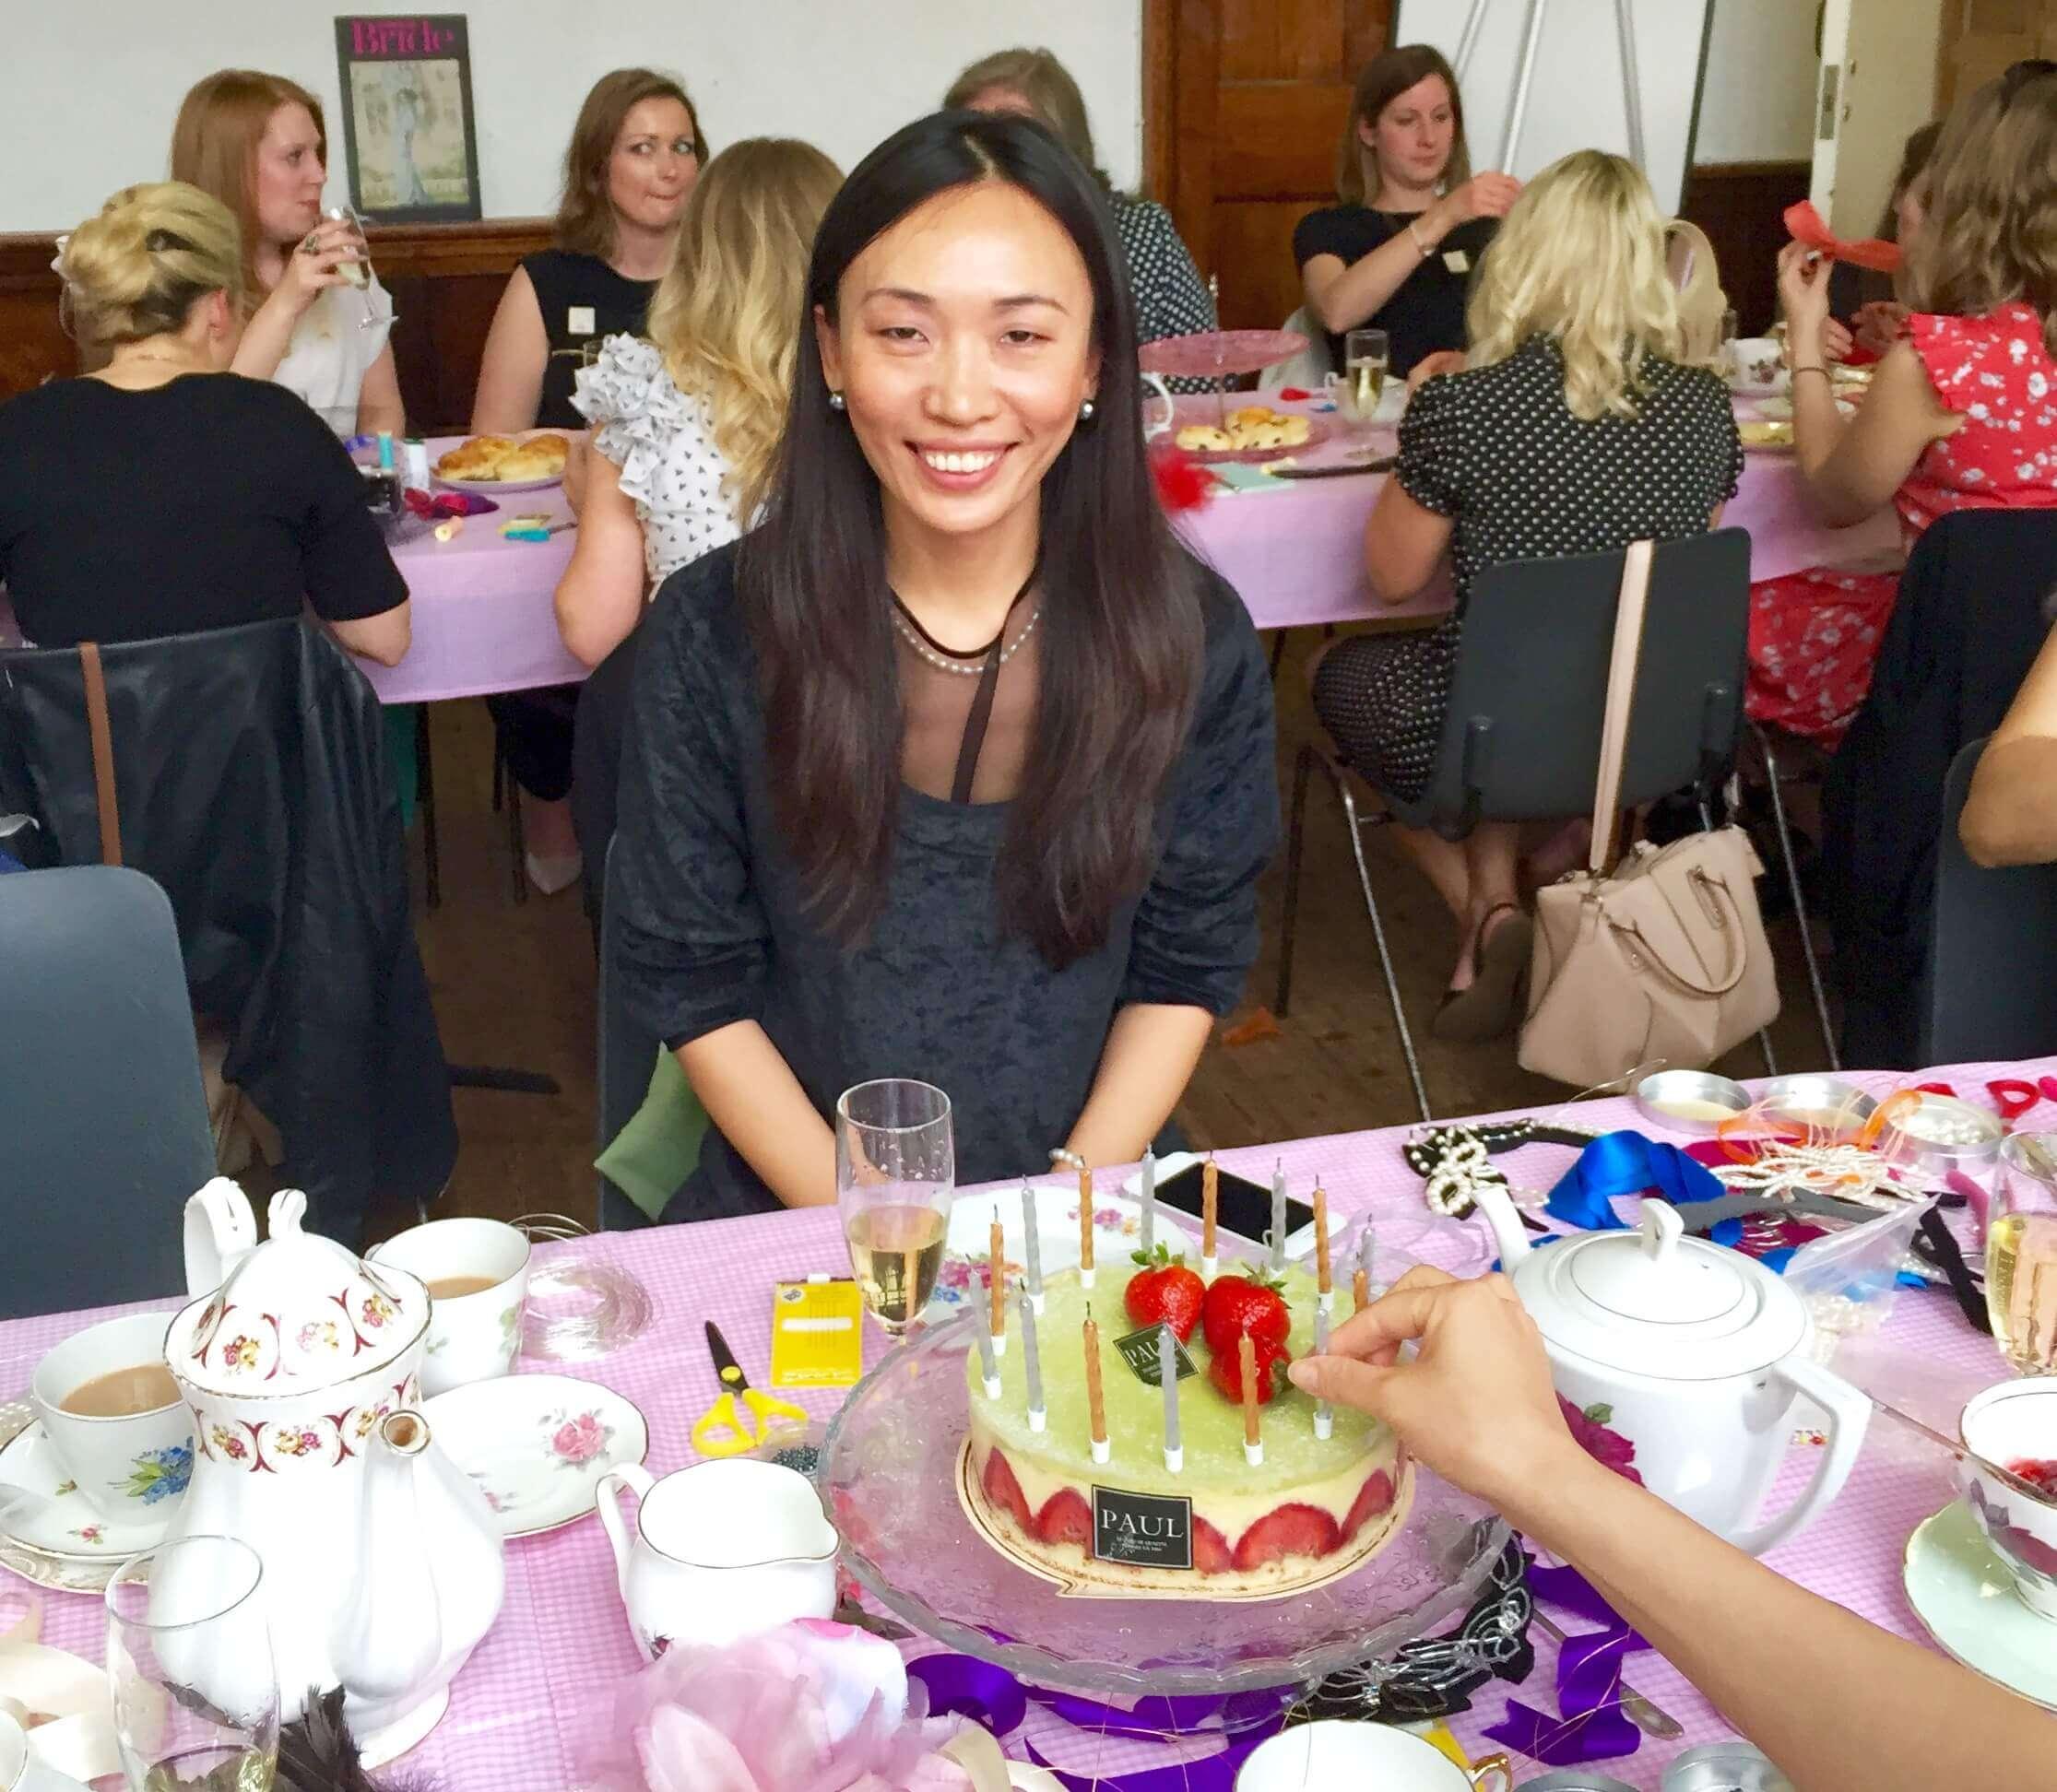 Birthday celebrations at Glam hatters